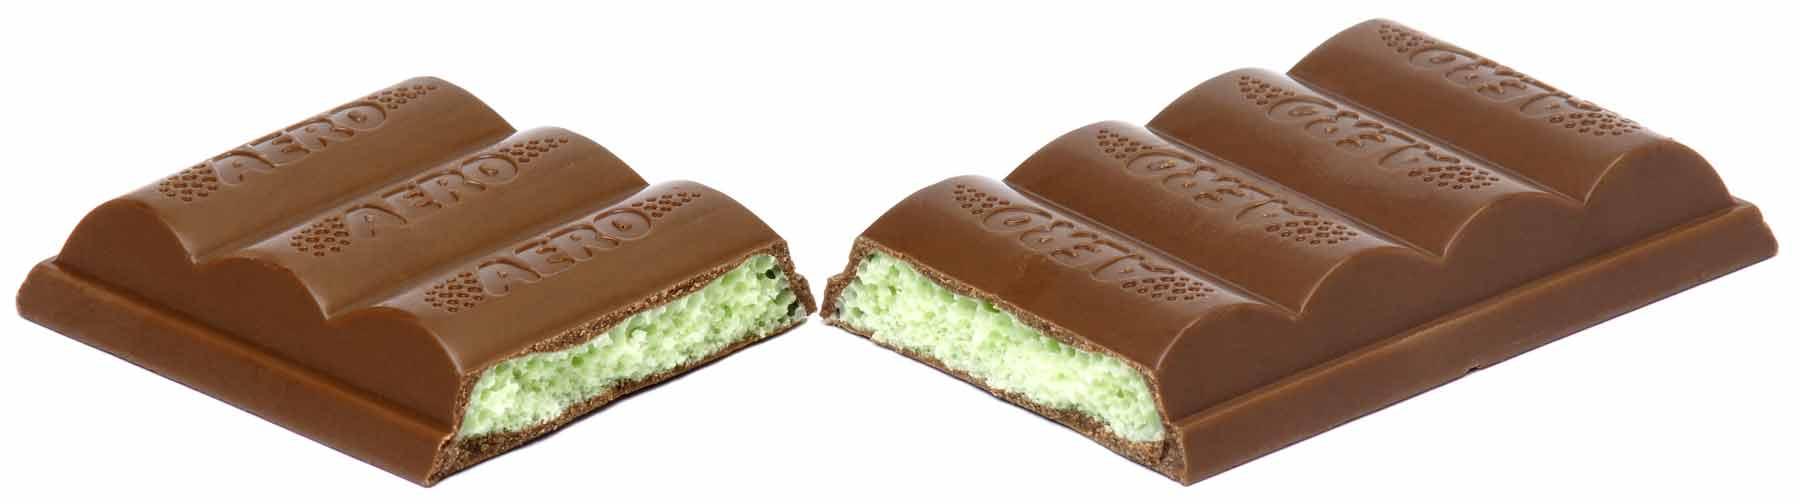 Chocolate mint Aero bar